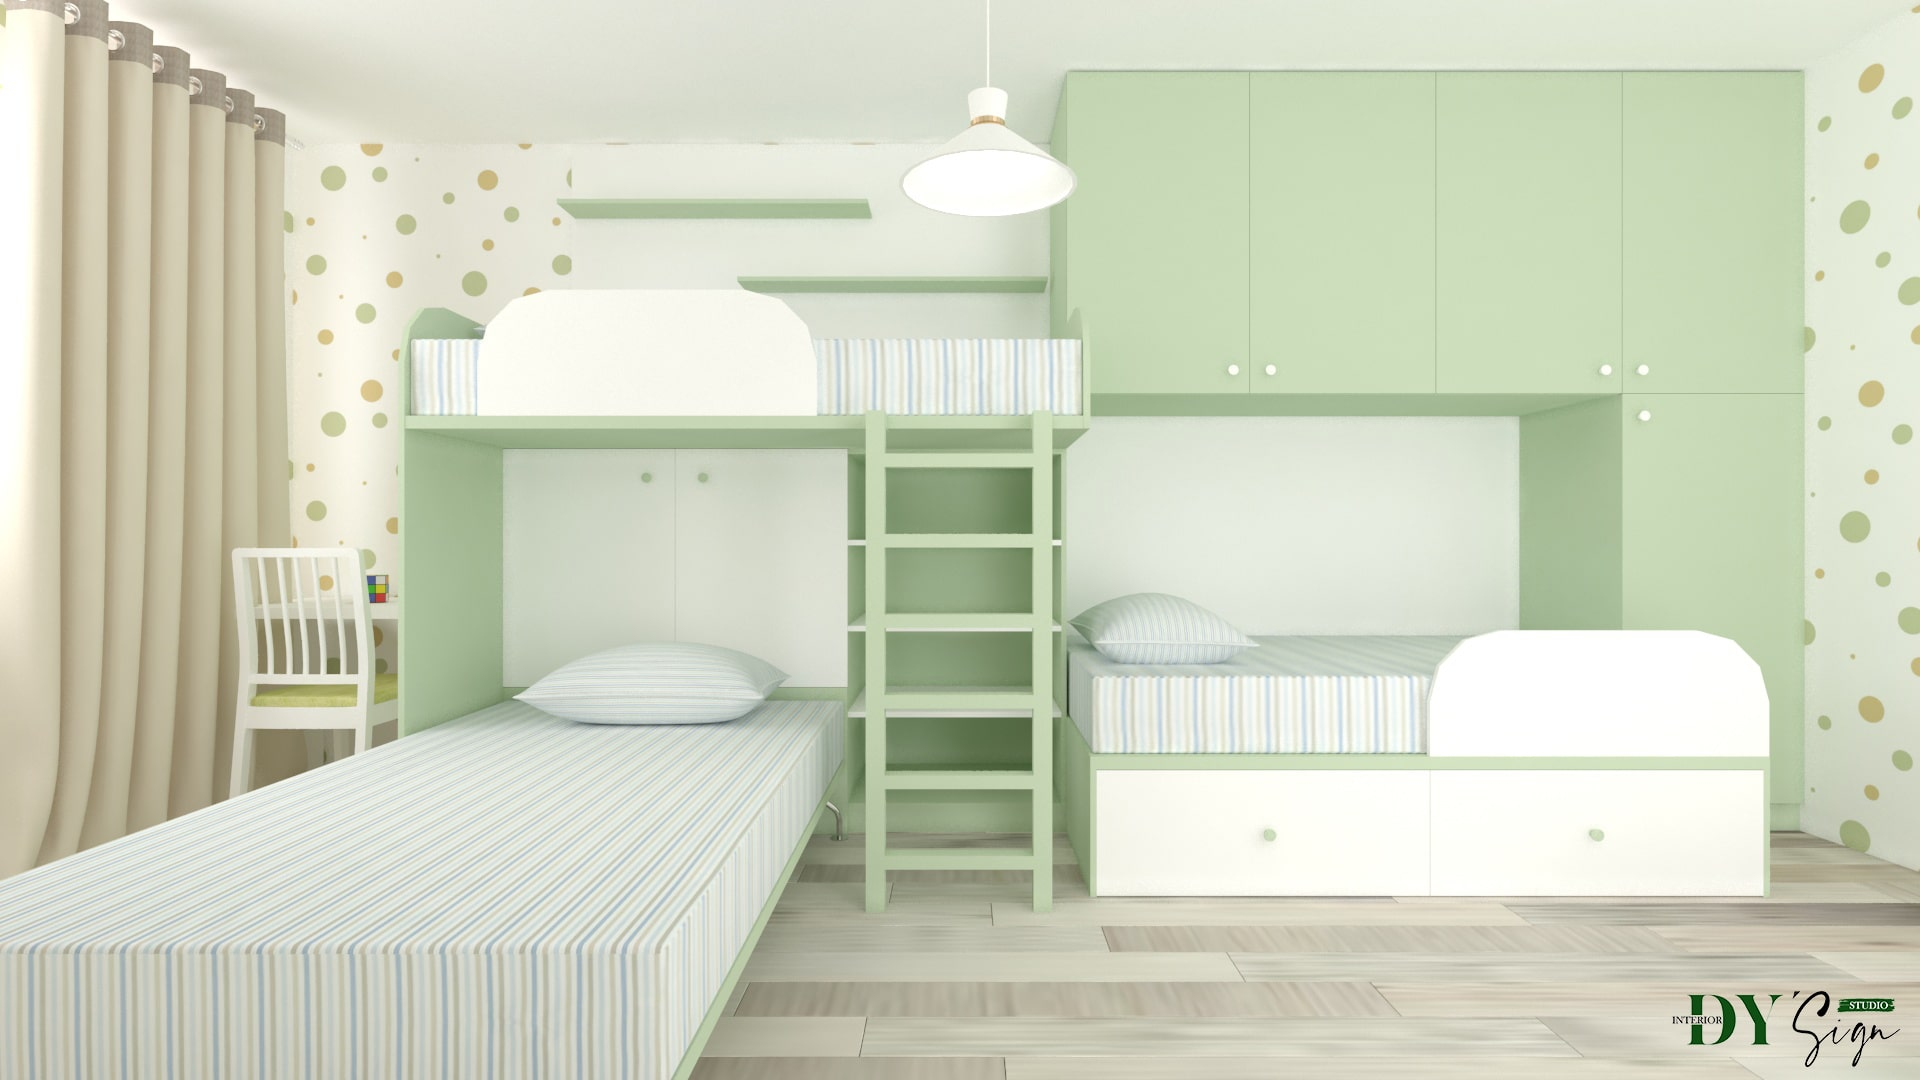 Интериор проекти - Детска стая в зелено и оранж